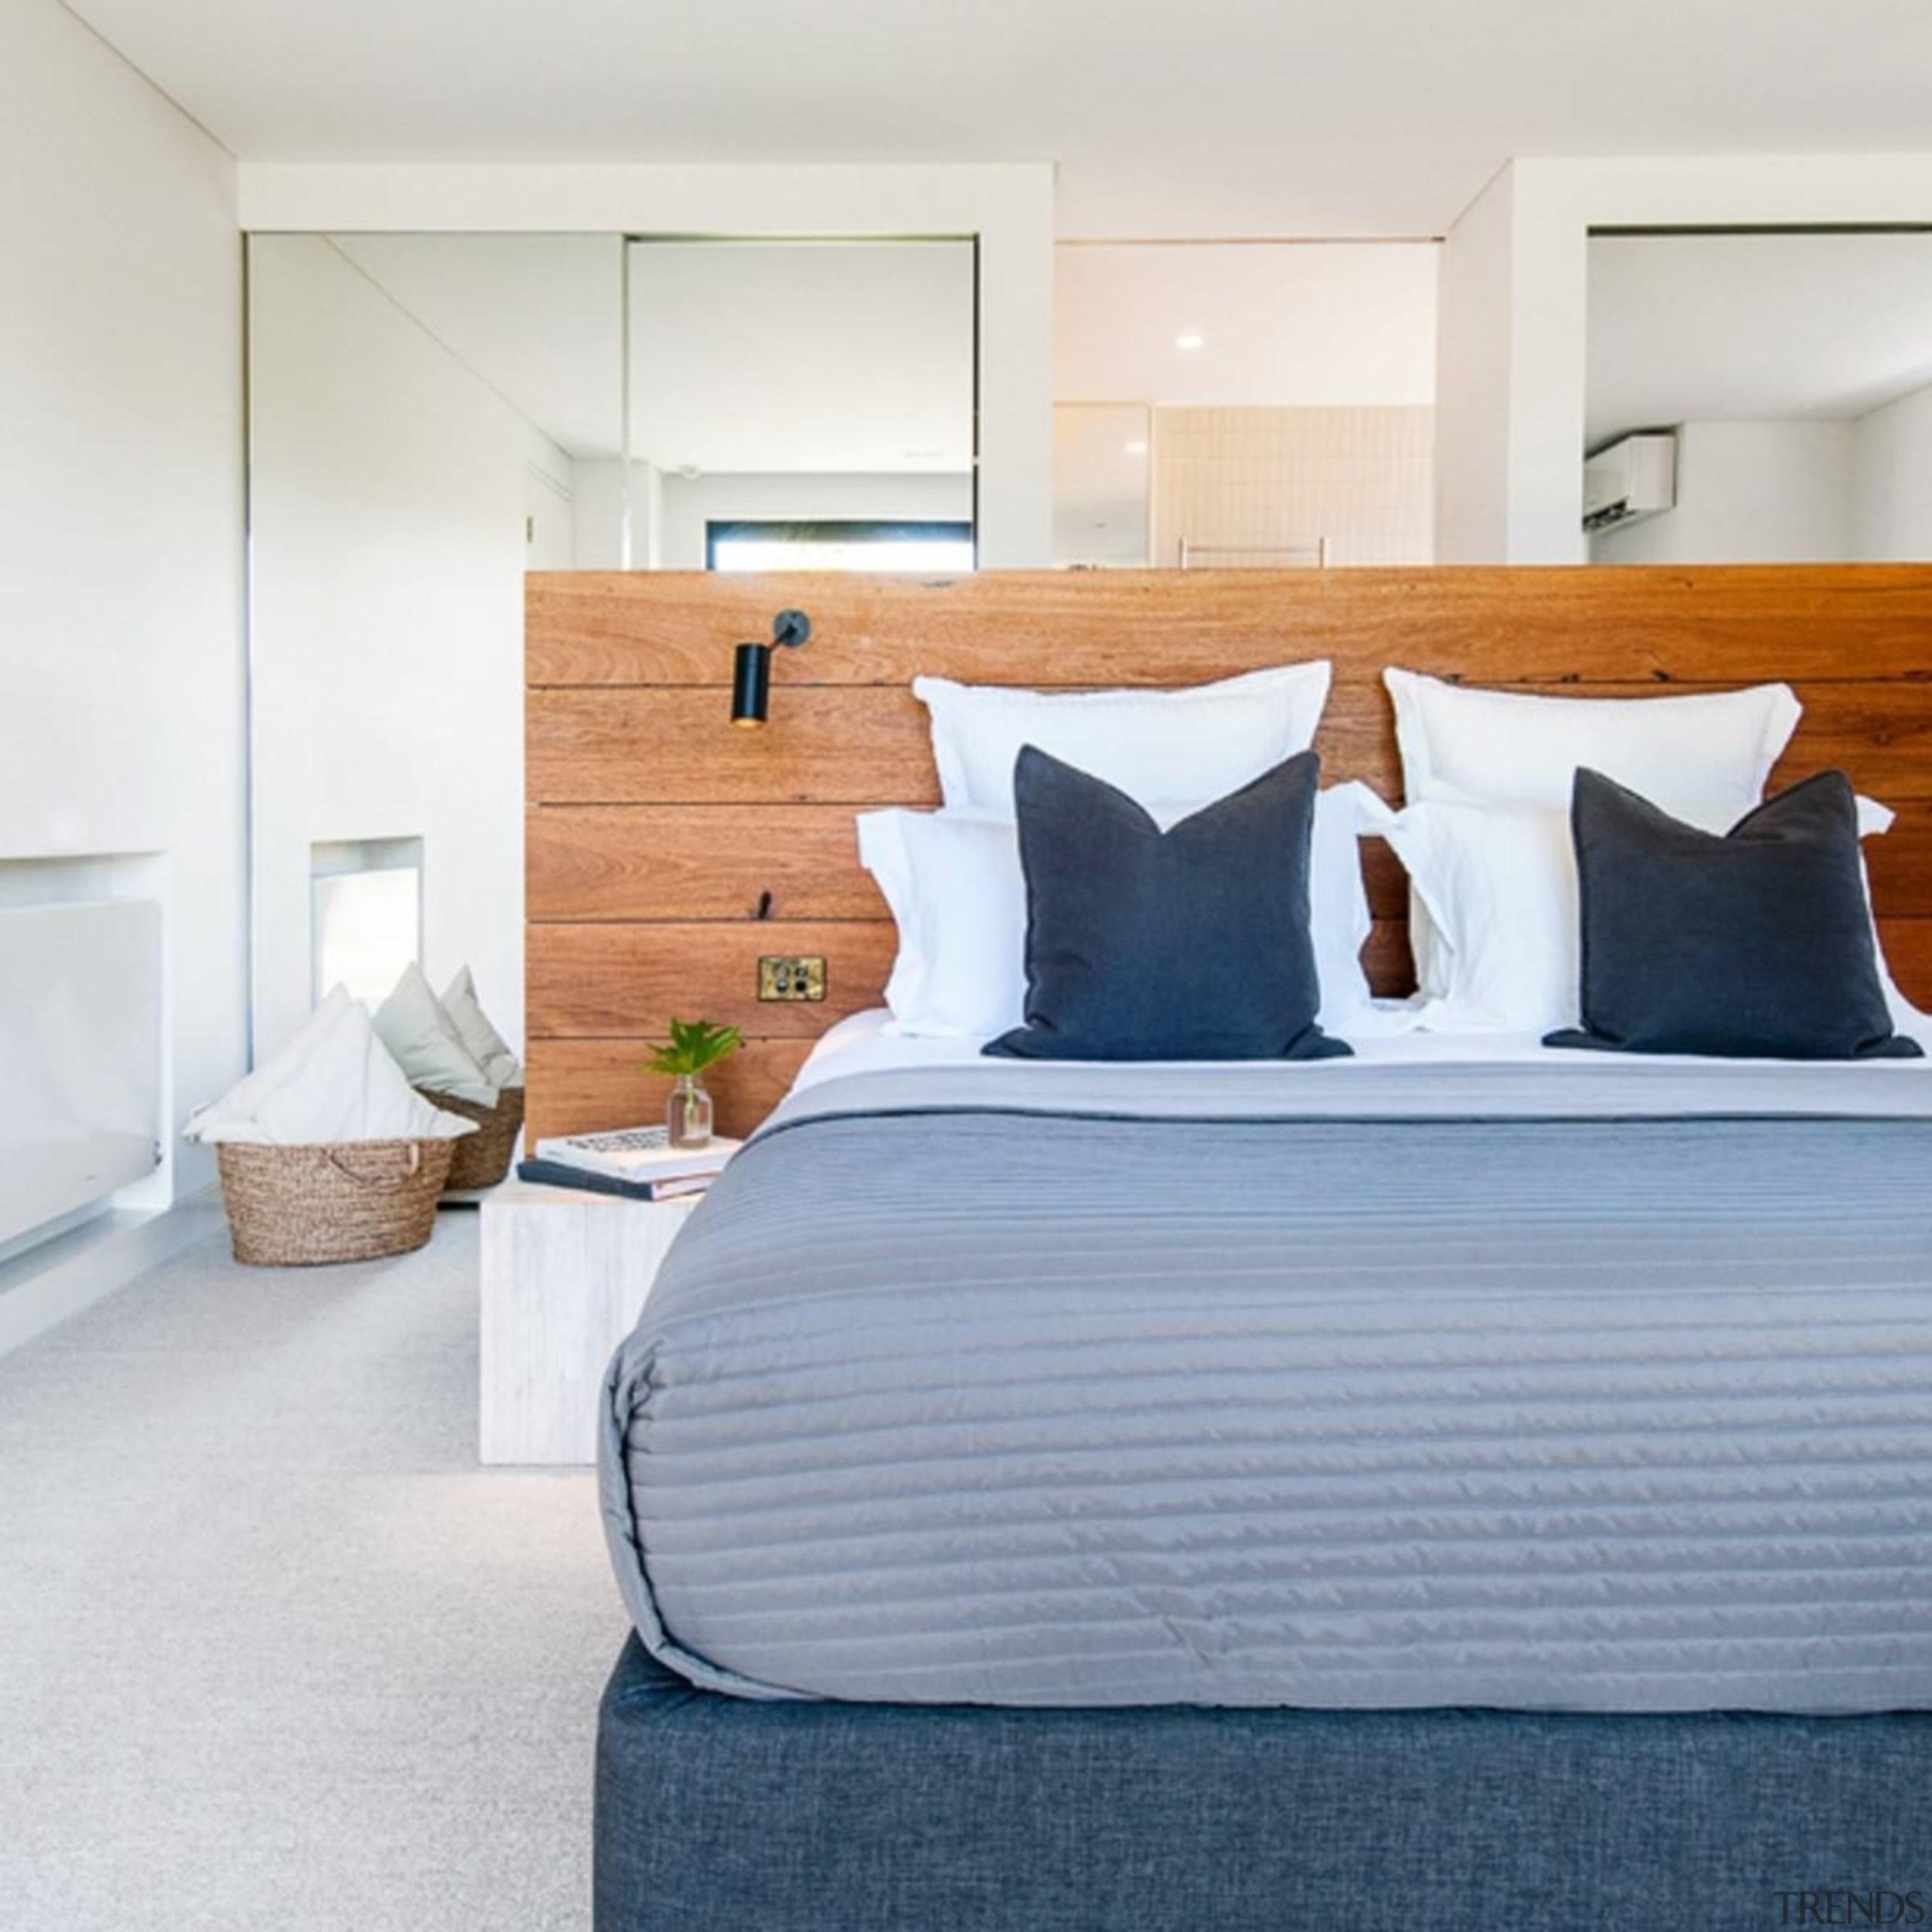 Architect: Alexandra Buchanan ArchitecturePhotography by Debra McFadzean bed, bed frame, bed sheet, bedroom, floor, home, interior design, mattress, room, suite, wall, white, gray